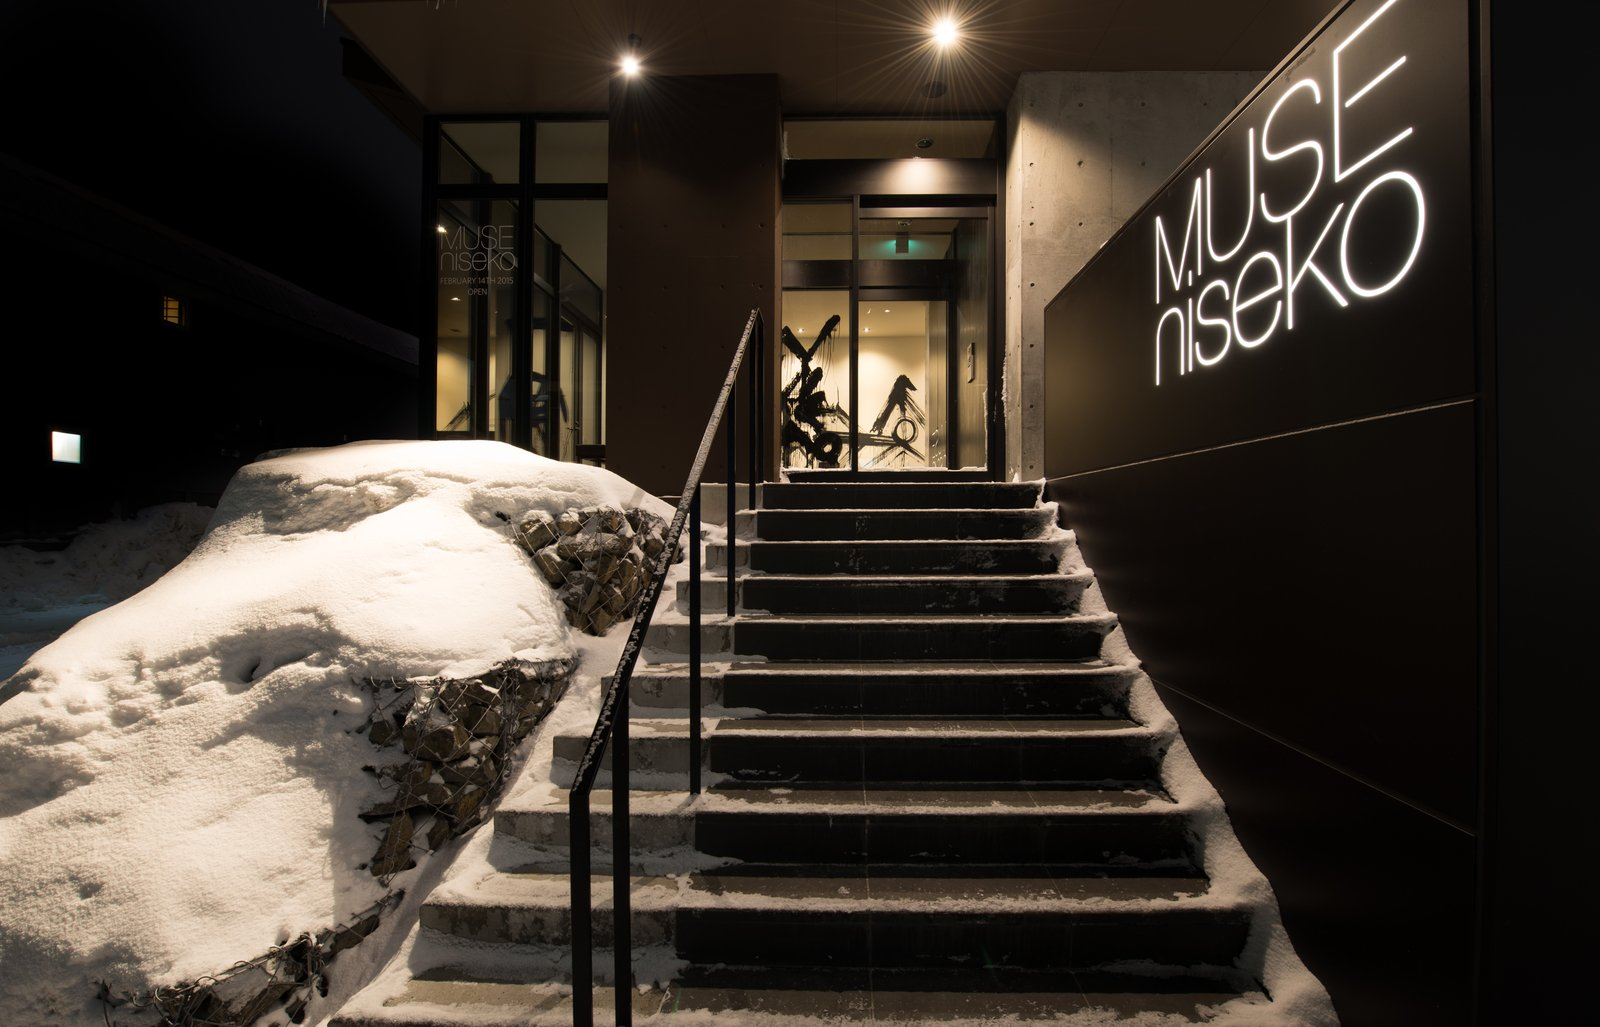 Muse niseko entrance stair large